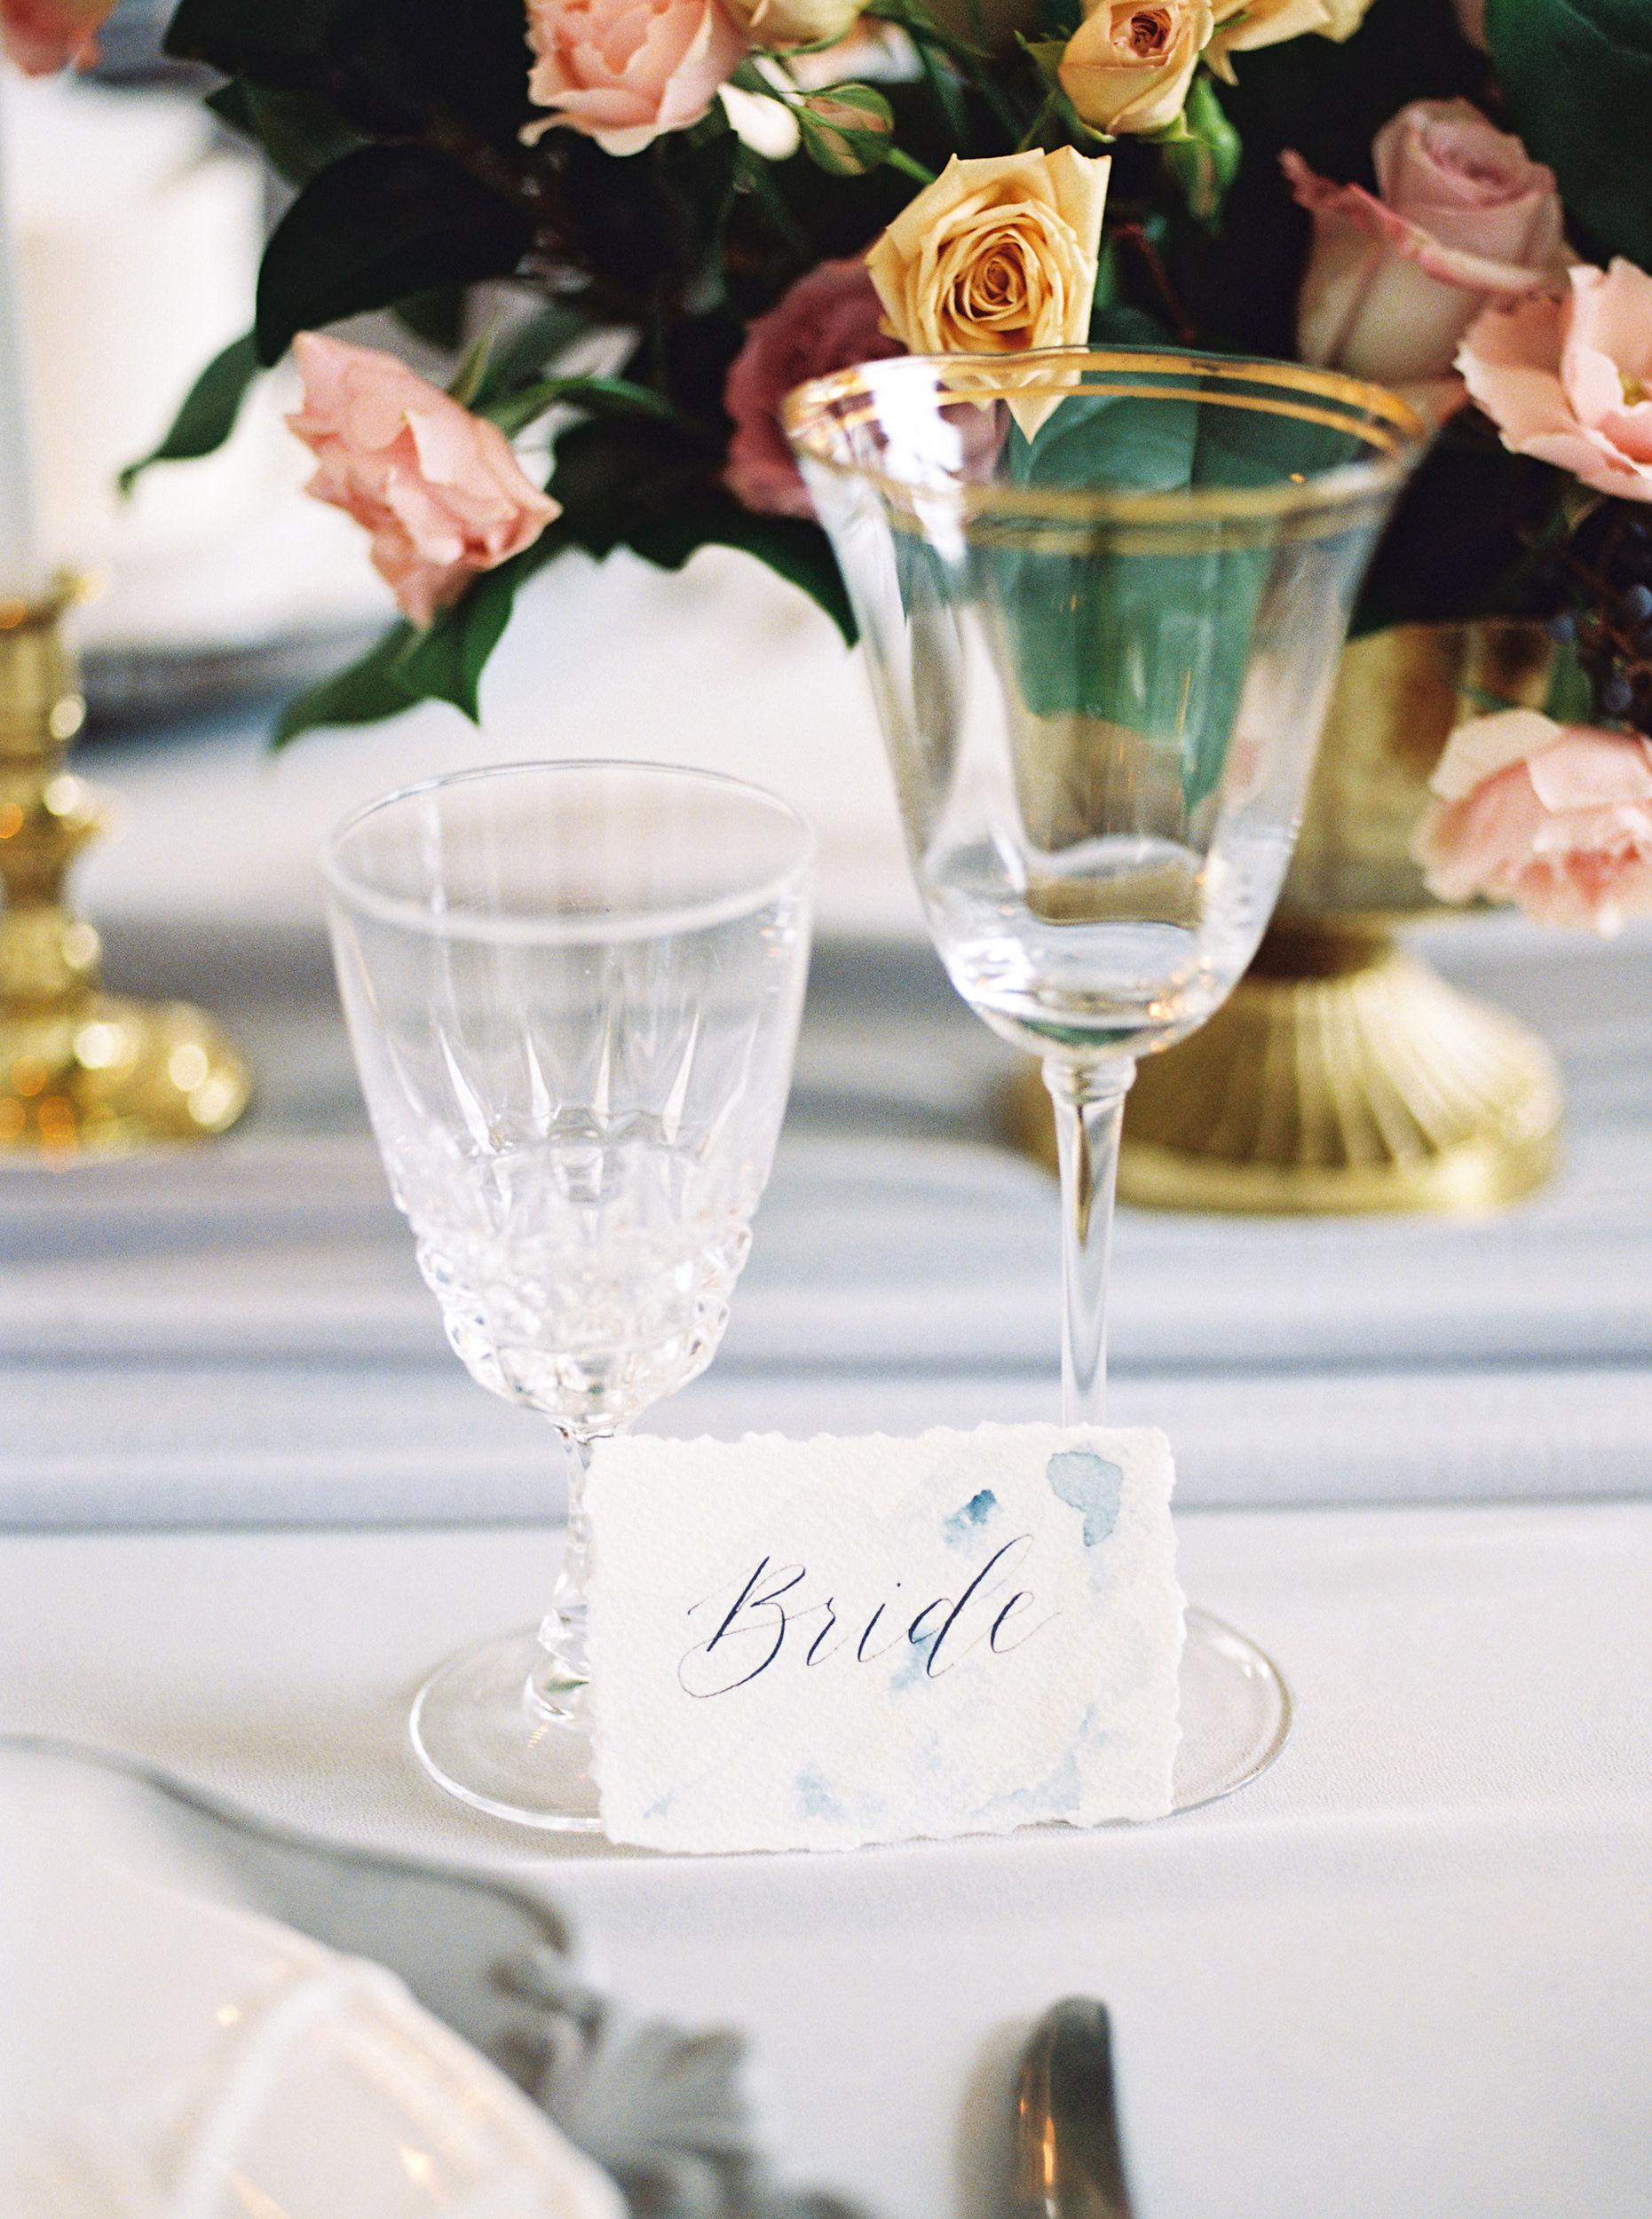 bride wedding place setting